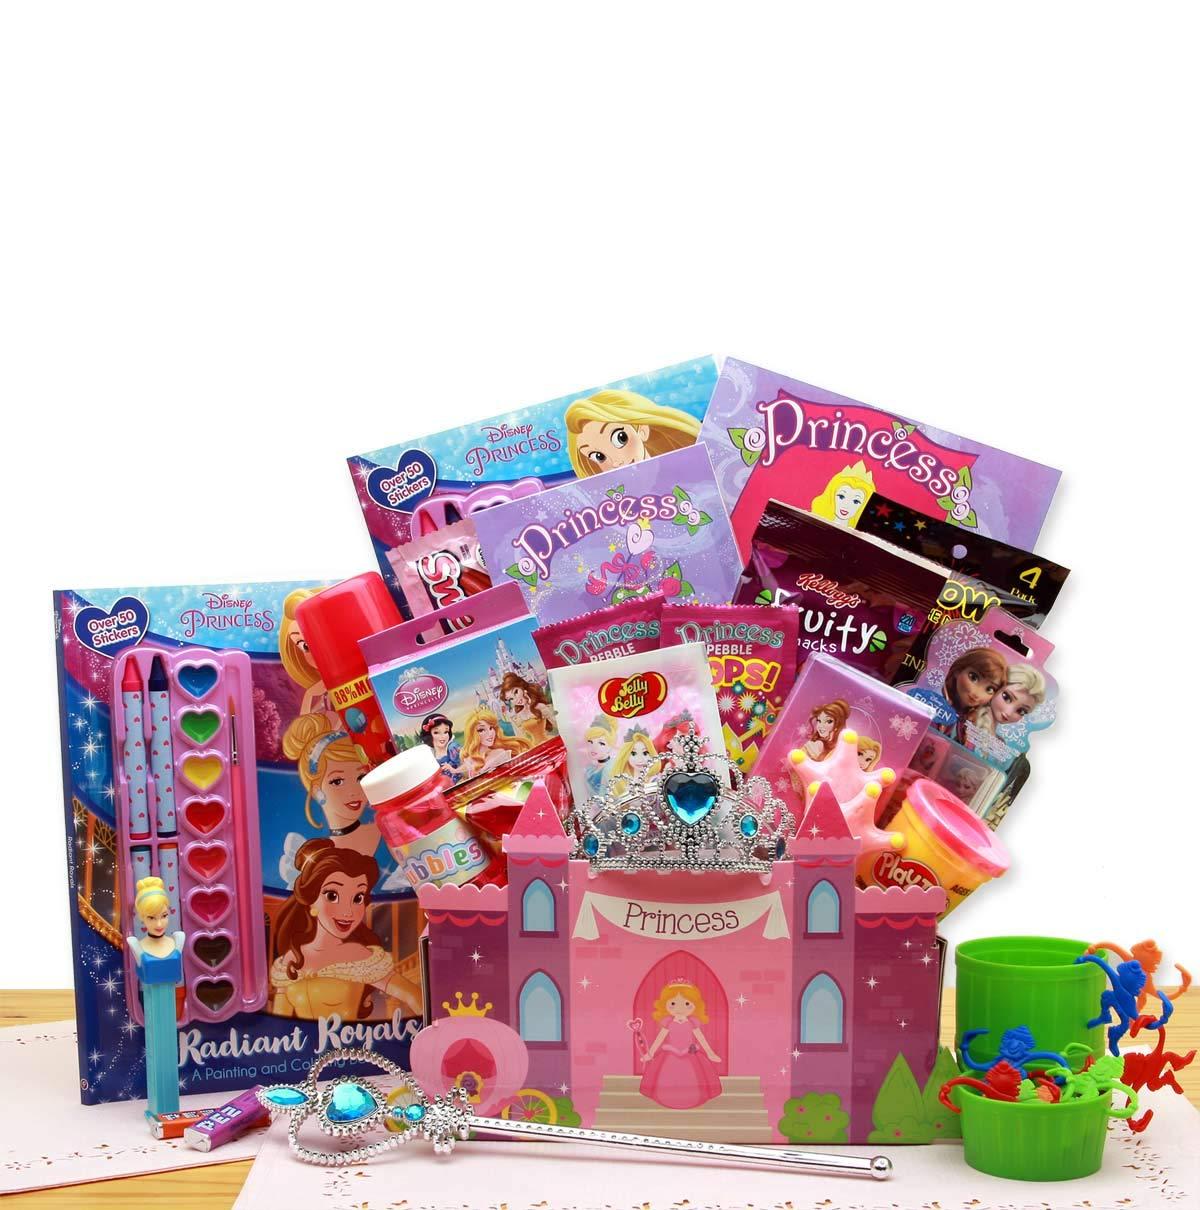 A Princess Fairytale Gift Box by Gift Basket Associates